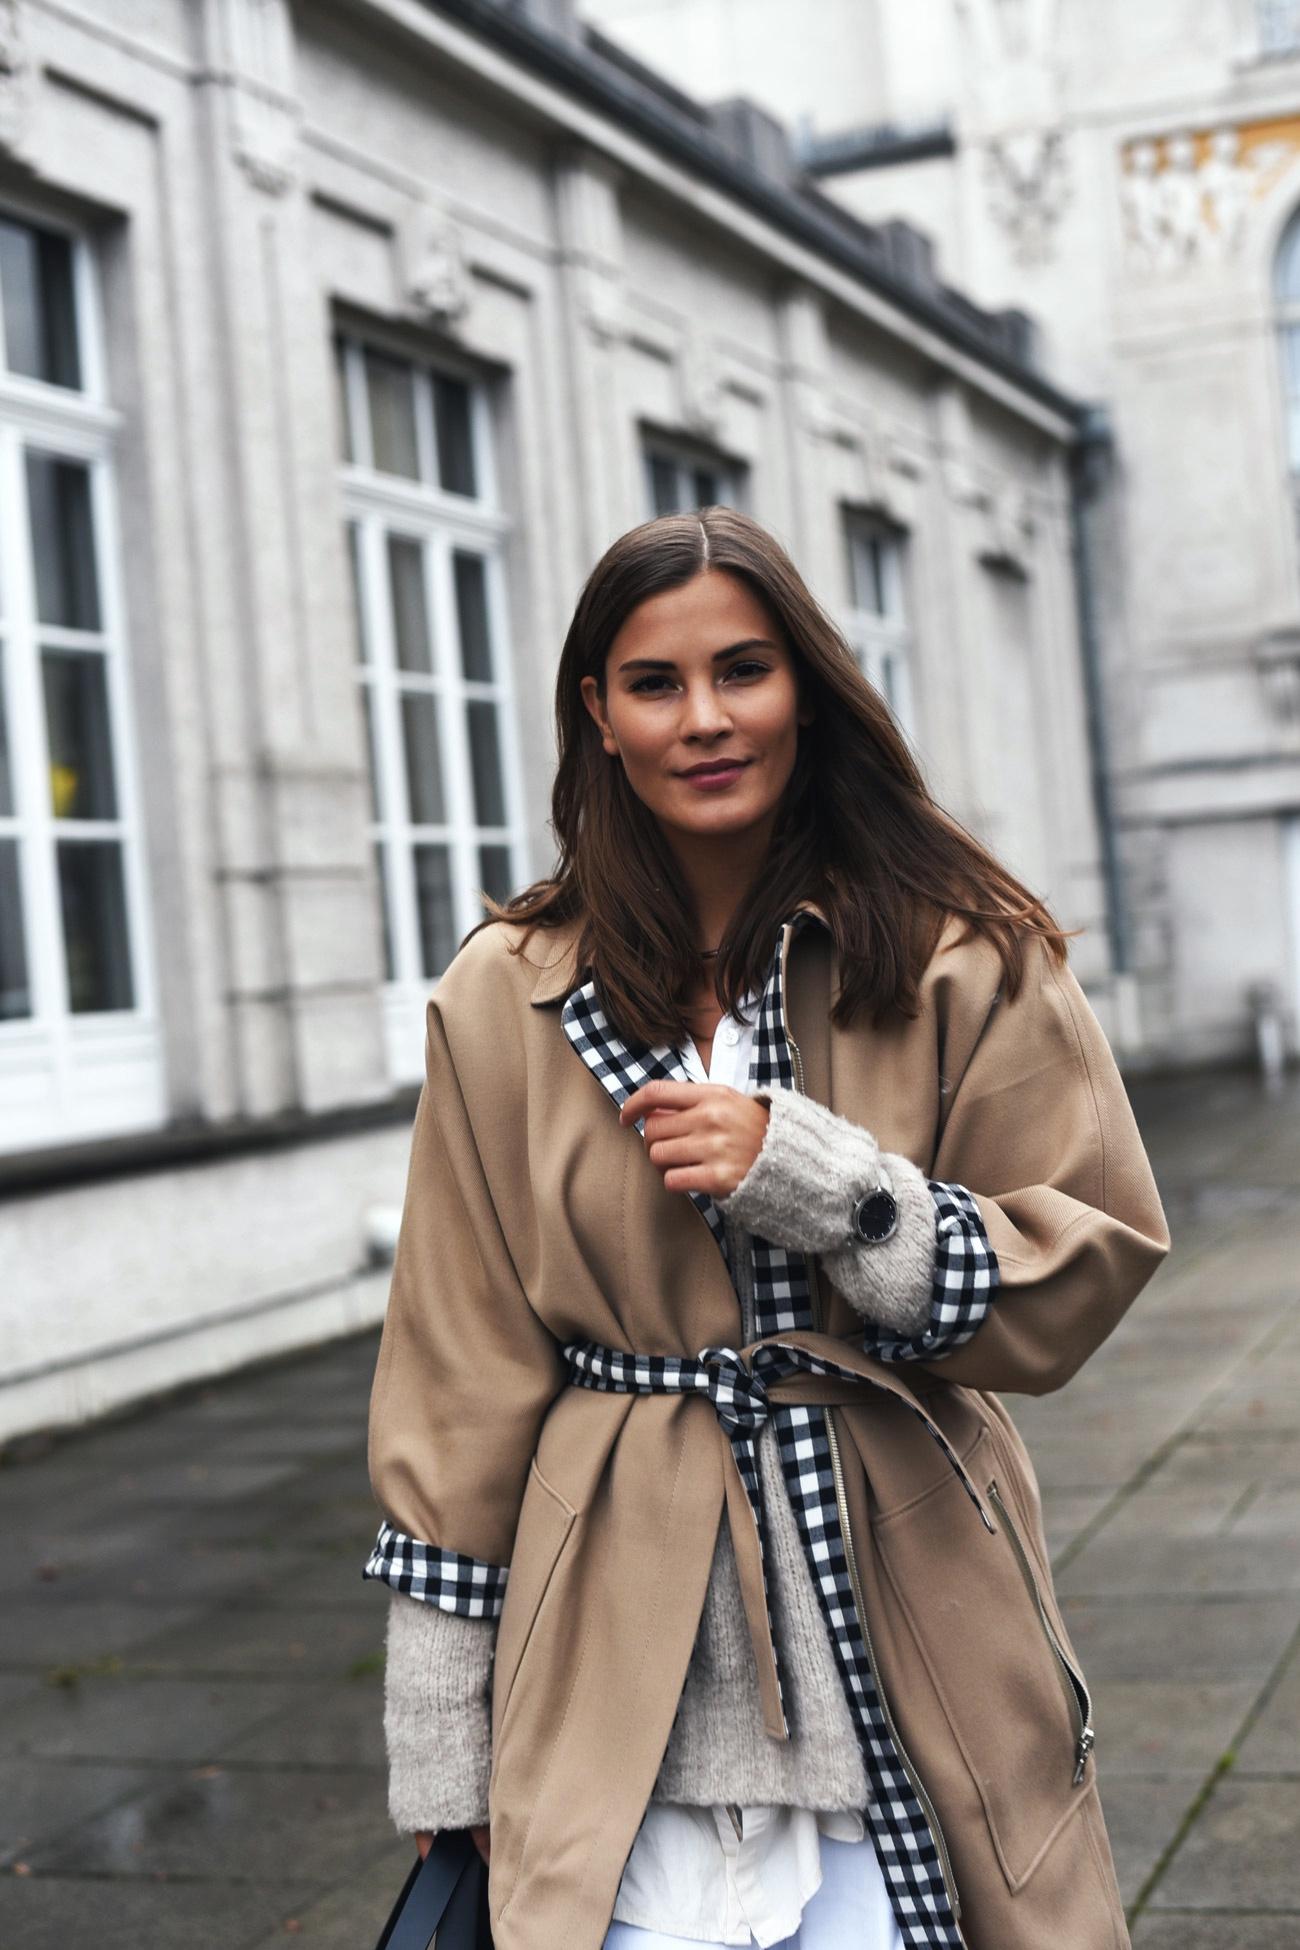 nina-schwichtenberg-fashion-full-time-blogger-germany-fashiioncarpet